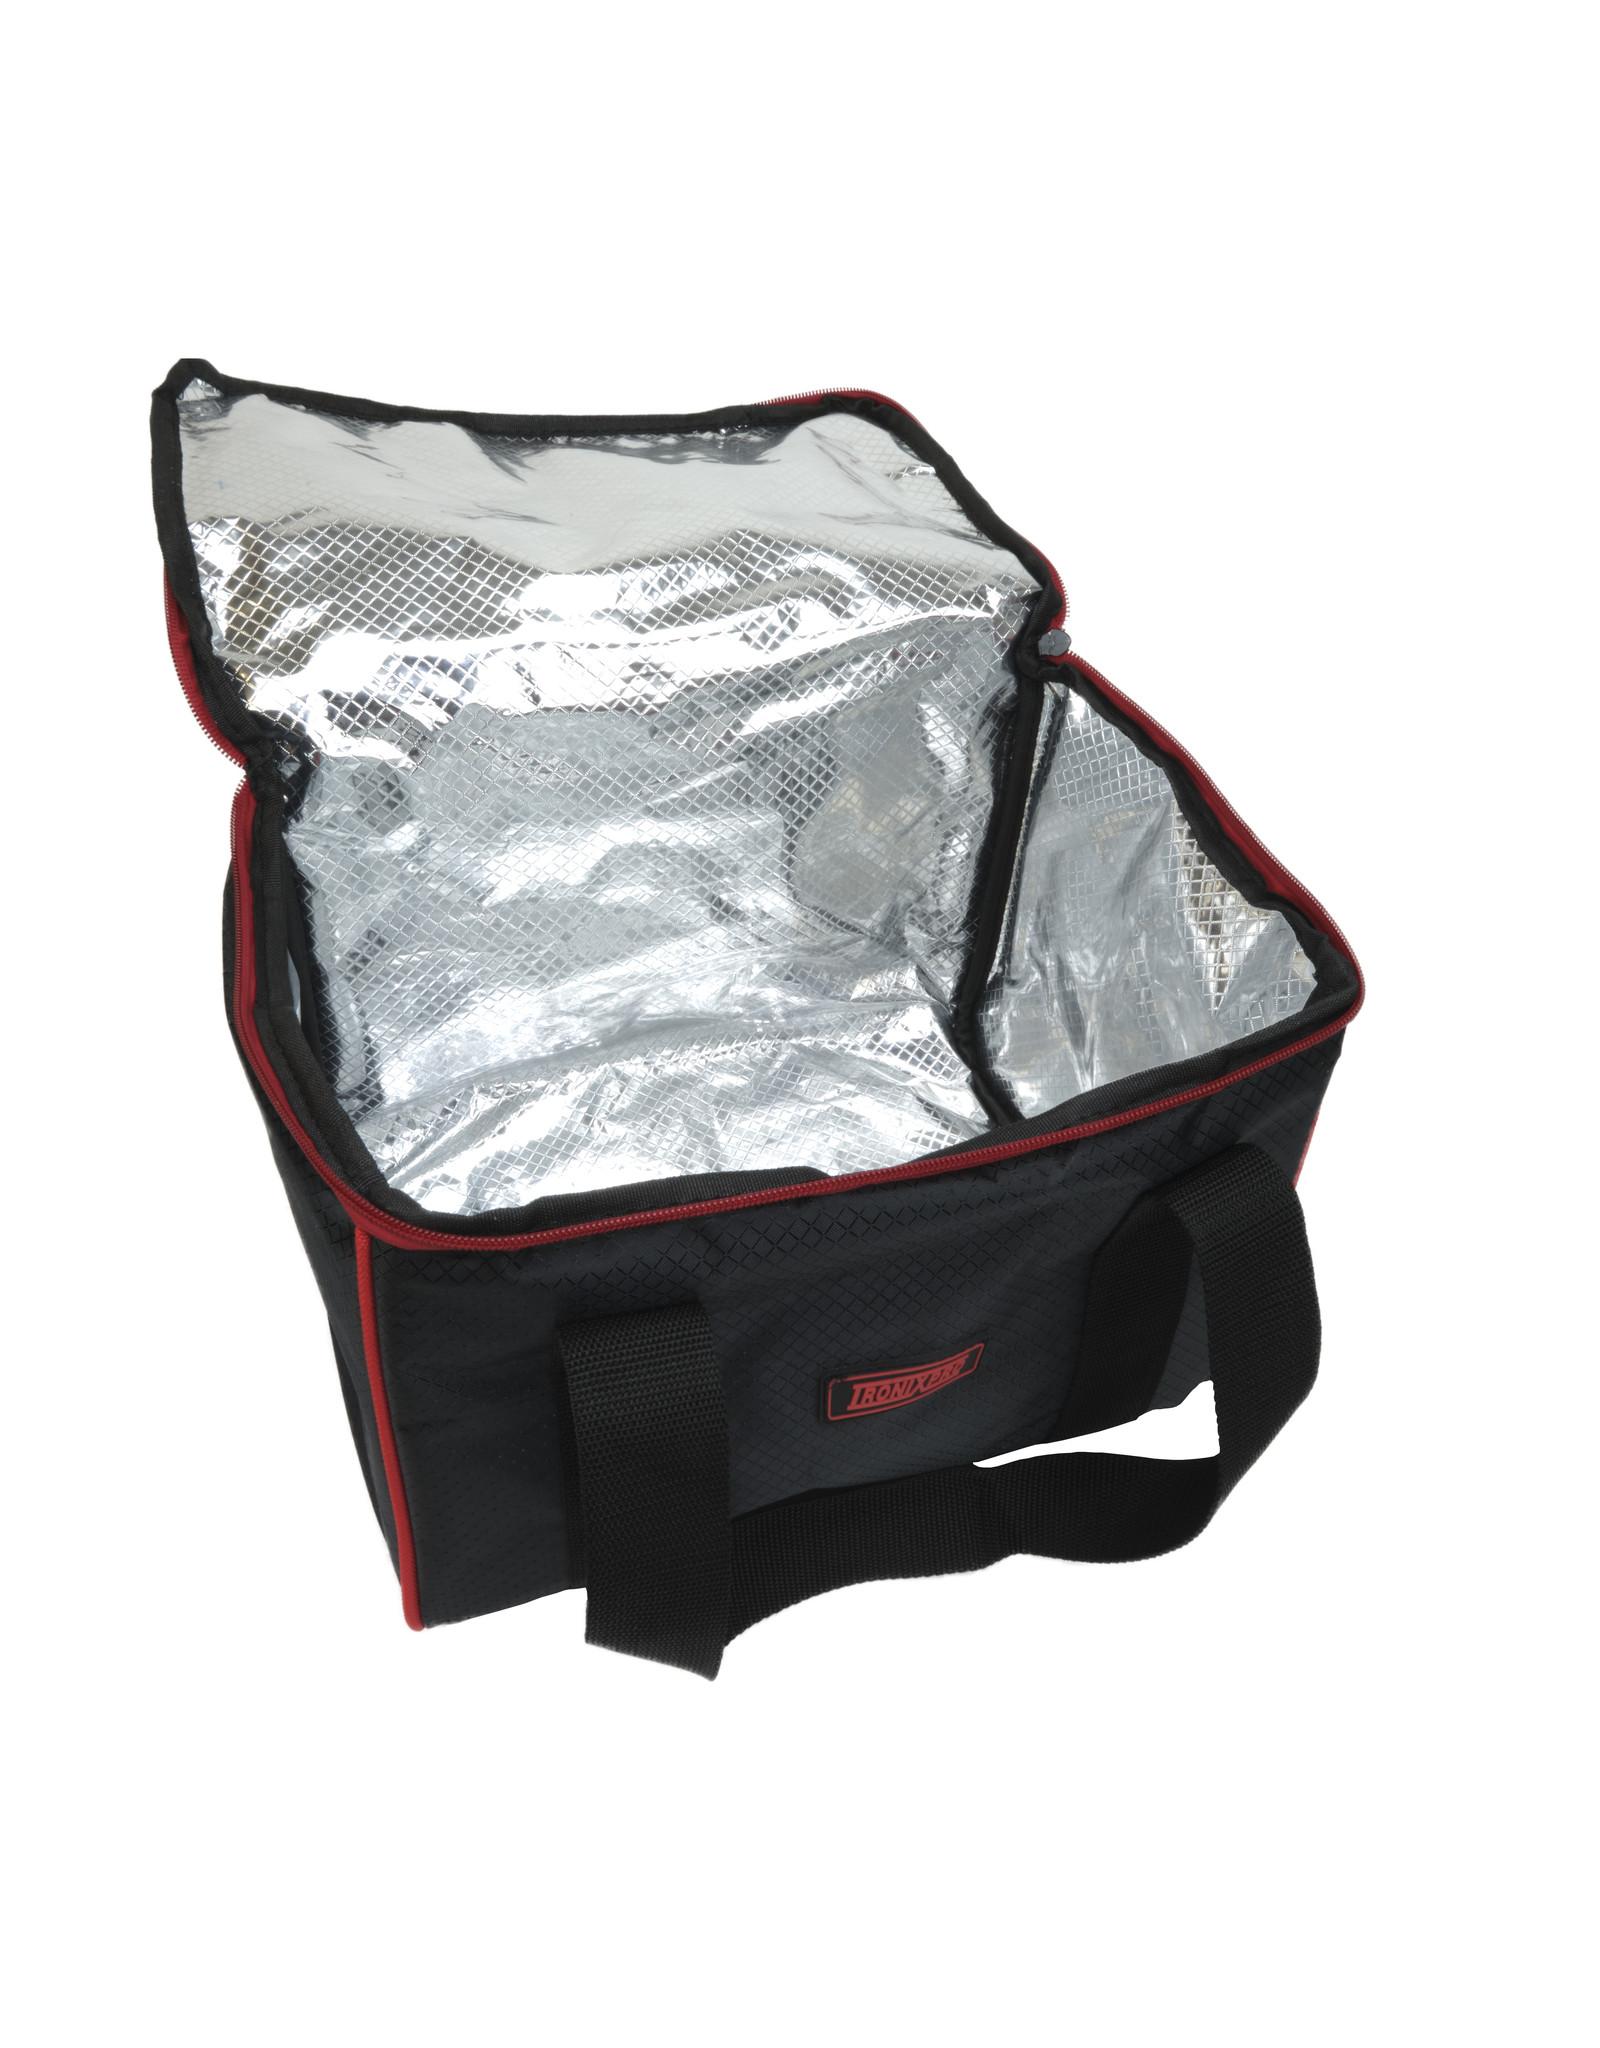 Tronix Tronixpro Cool Bag Large